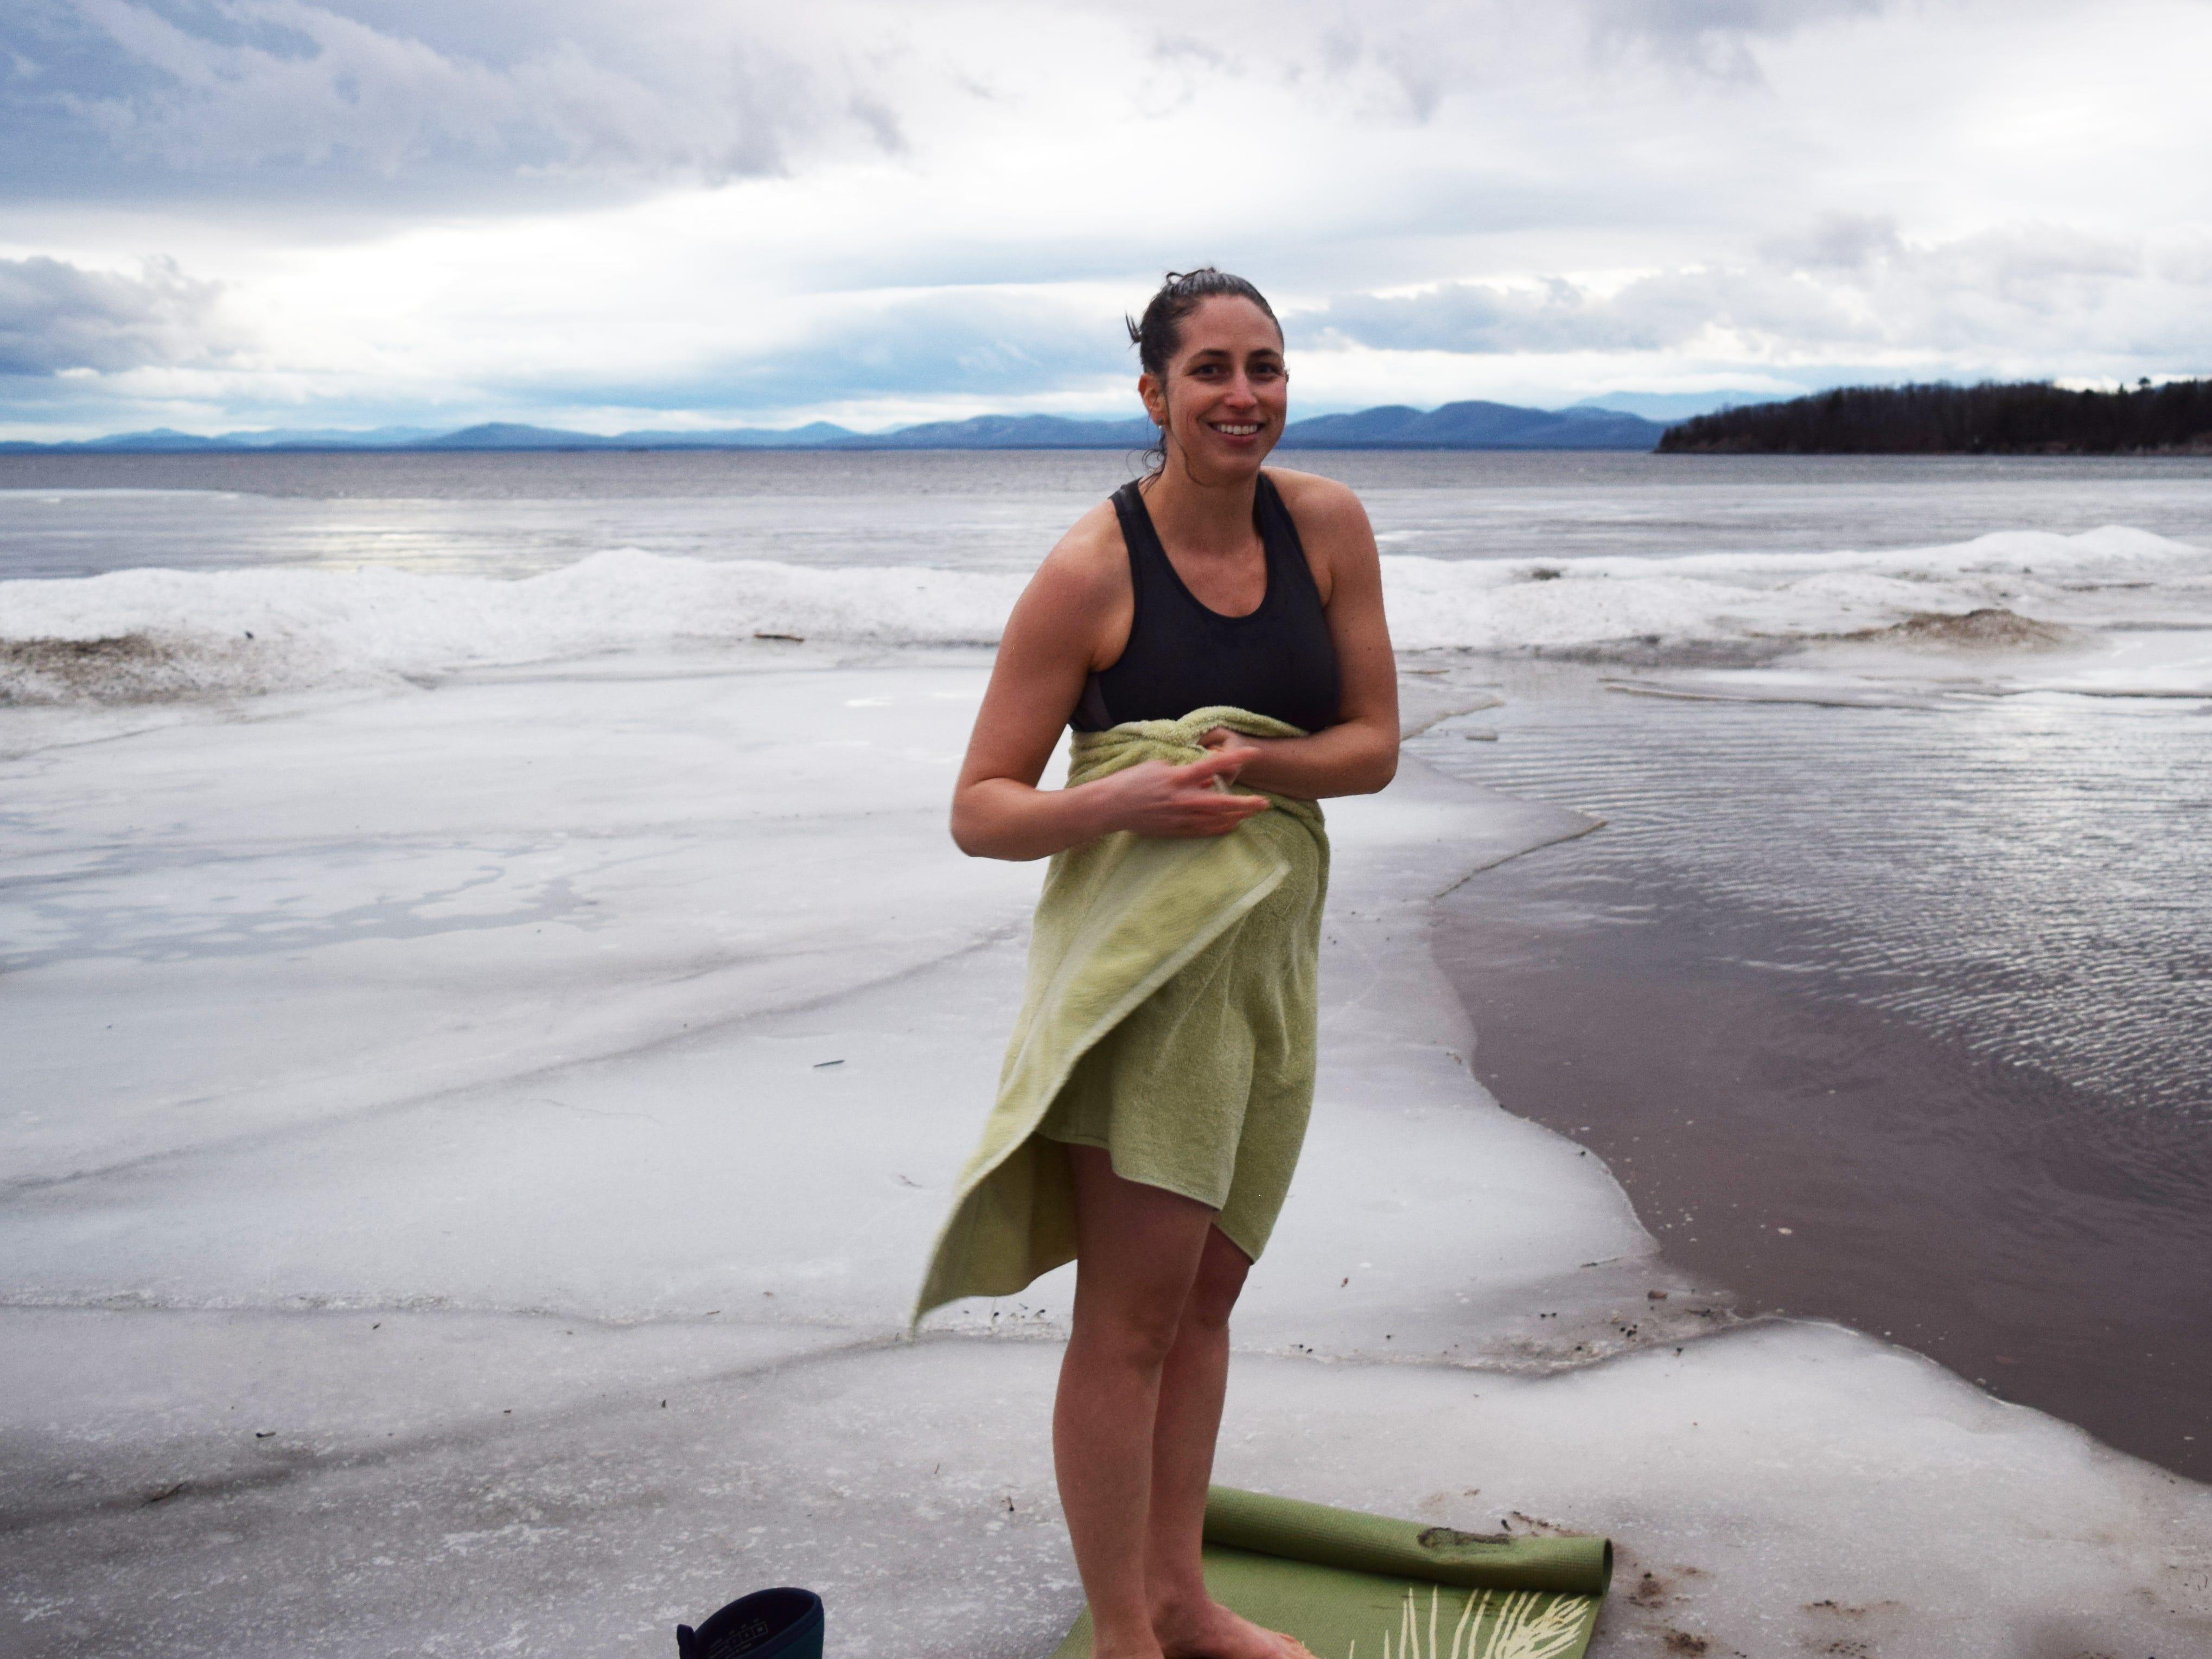 Elise Schadler of Burlington prepares to take a full-body dip in Lake Champlain on Feb. 21, 2018.